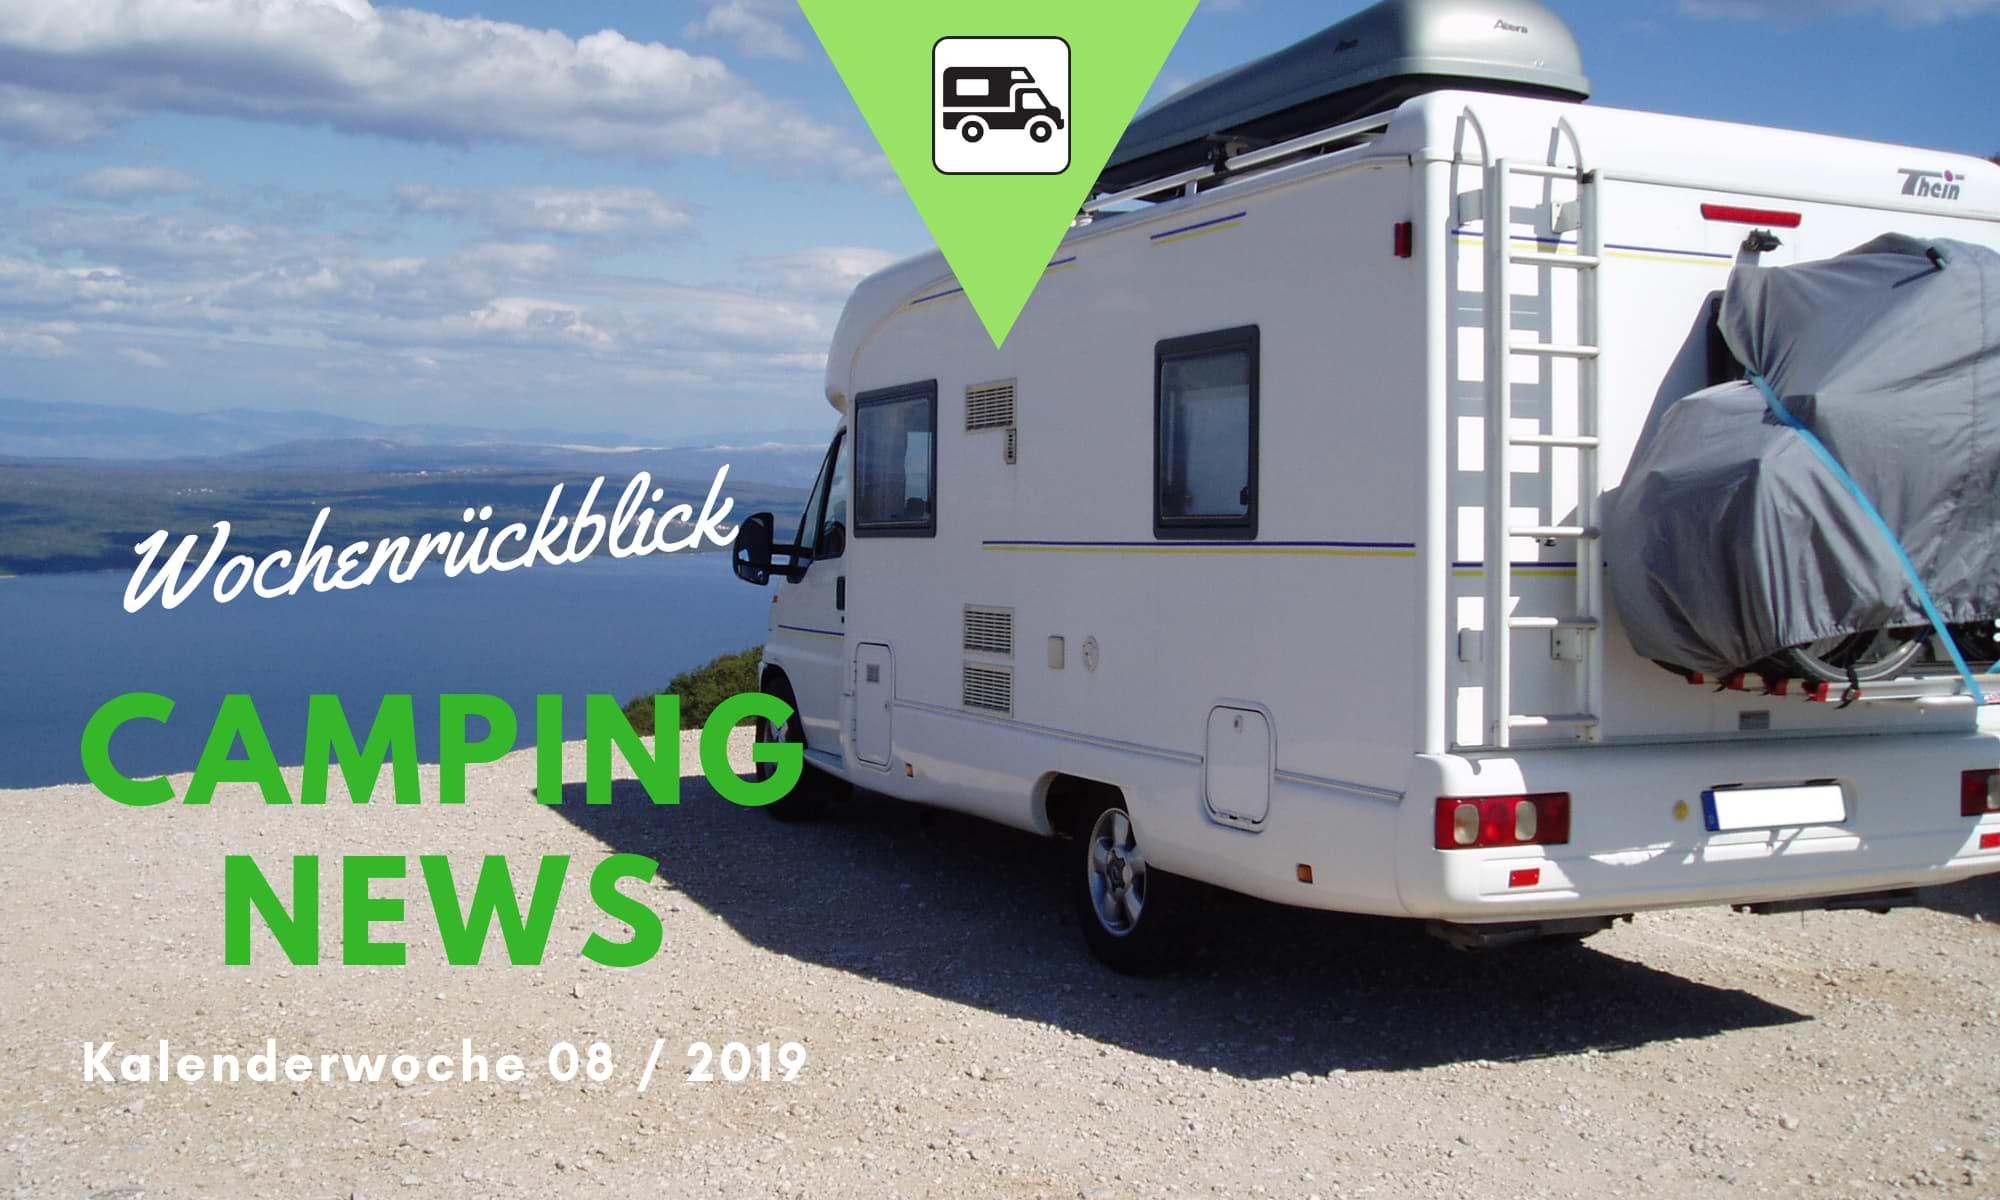 Wochenrückblick Camping News KW08-2019